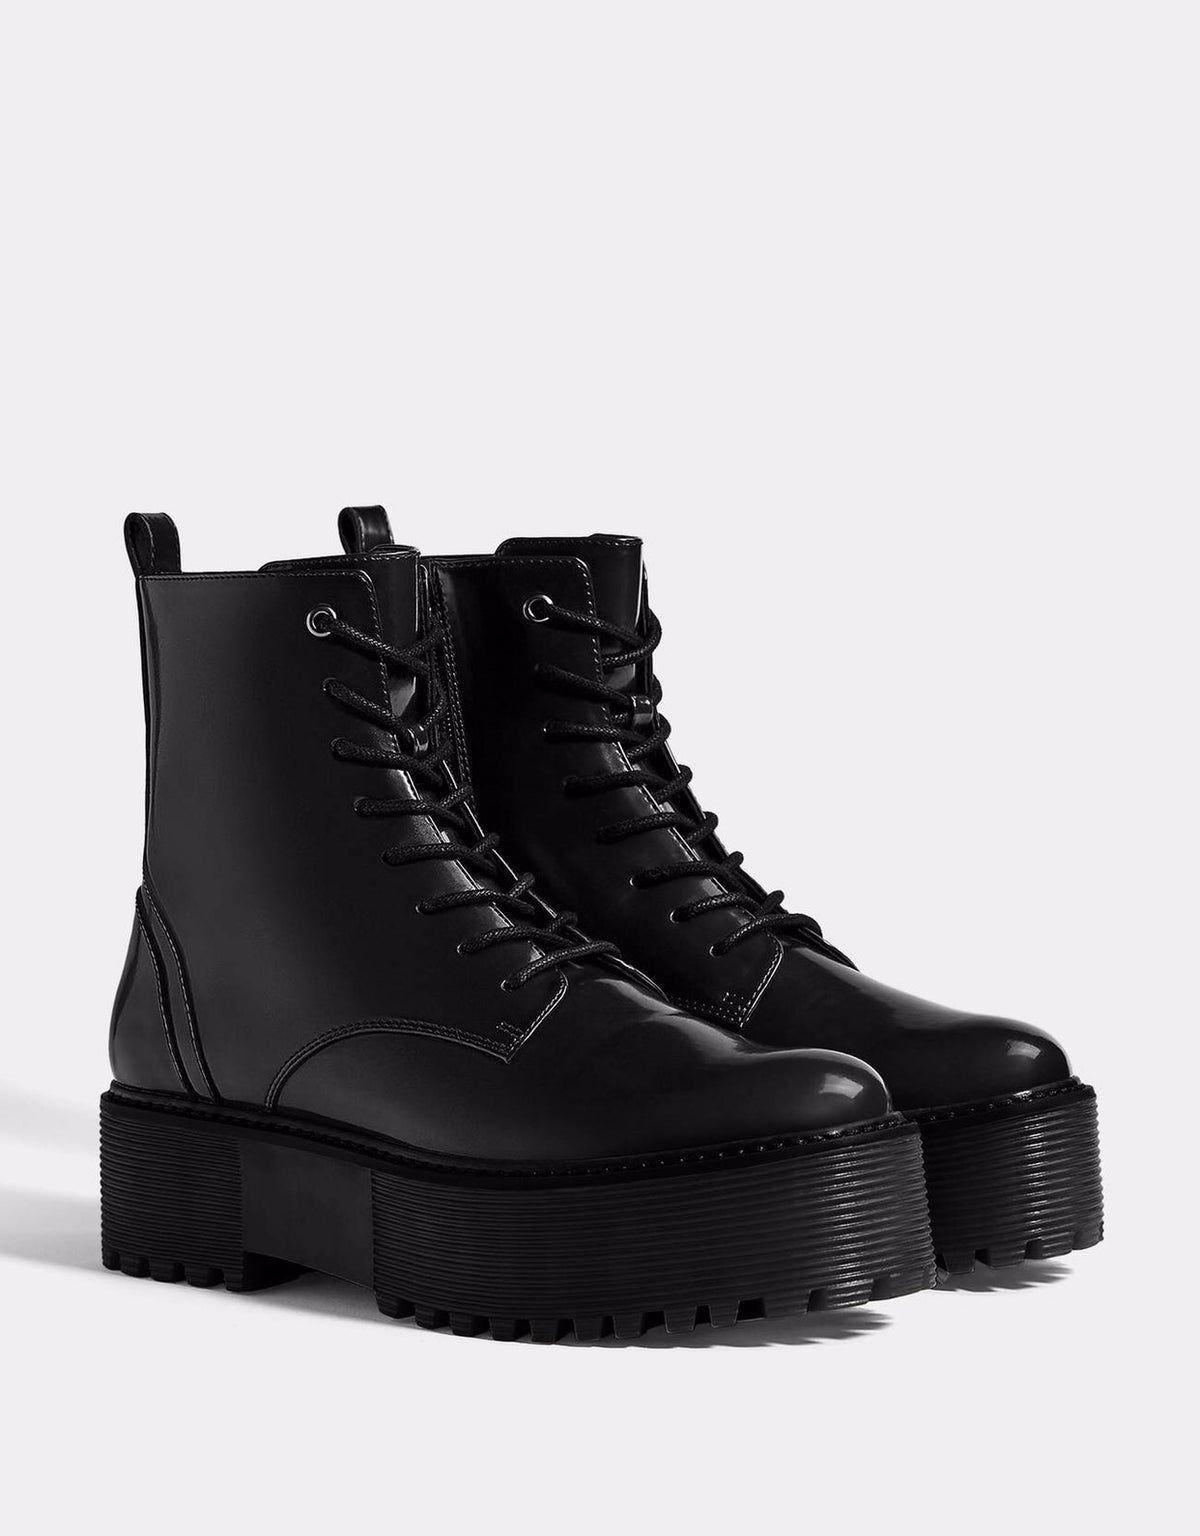 Bershka Chunky Black Combat Boots Sz 6 Platform Ankle Boots Shoe Boots Boots